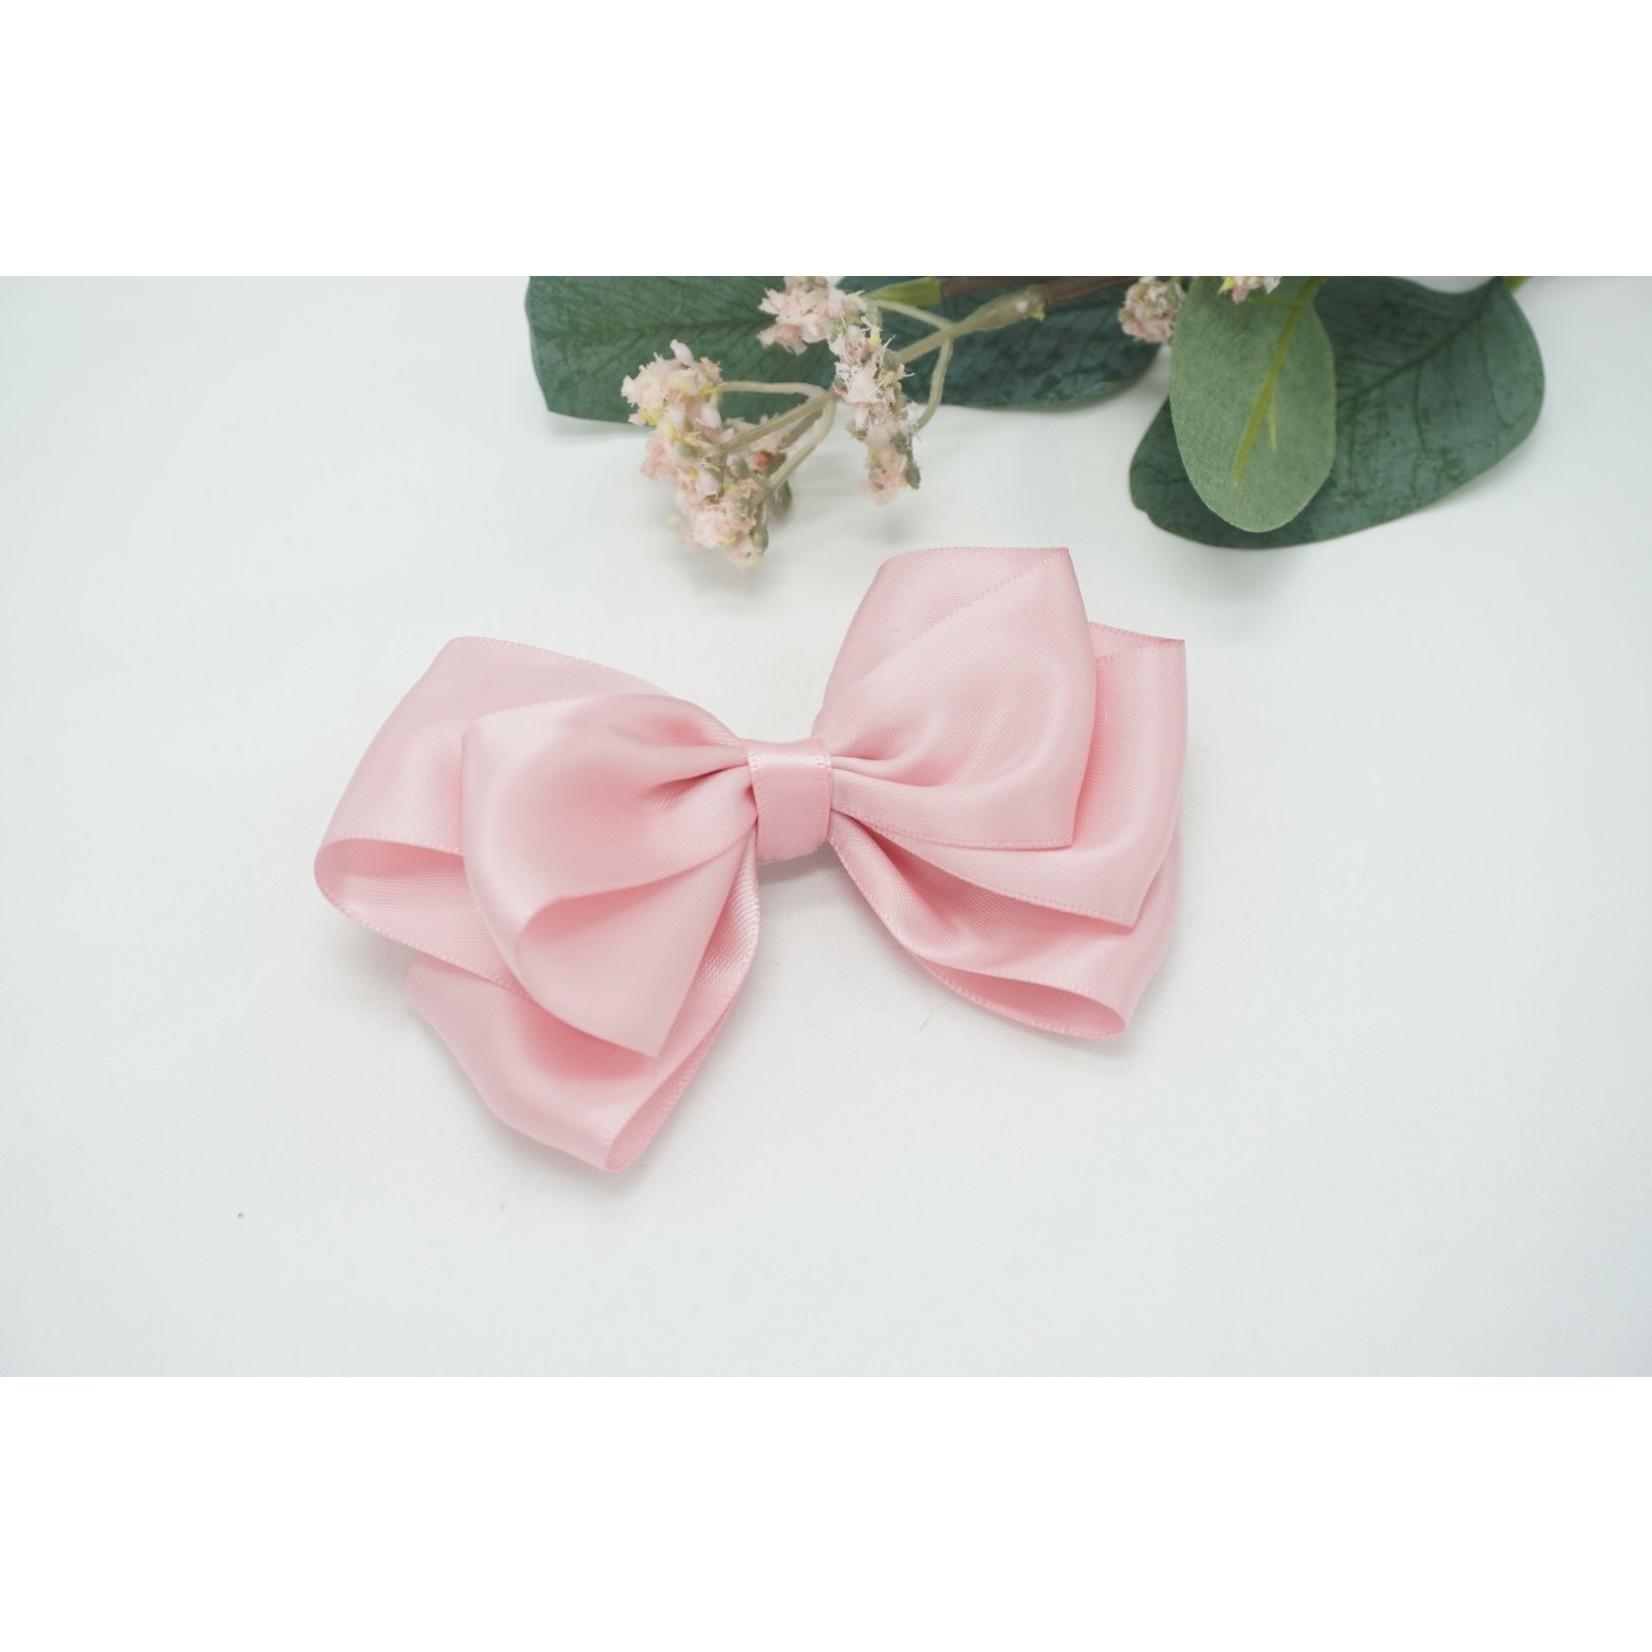 Petite Zara Butterfly Bow - Pink 12cm